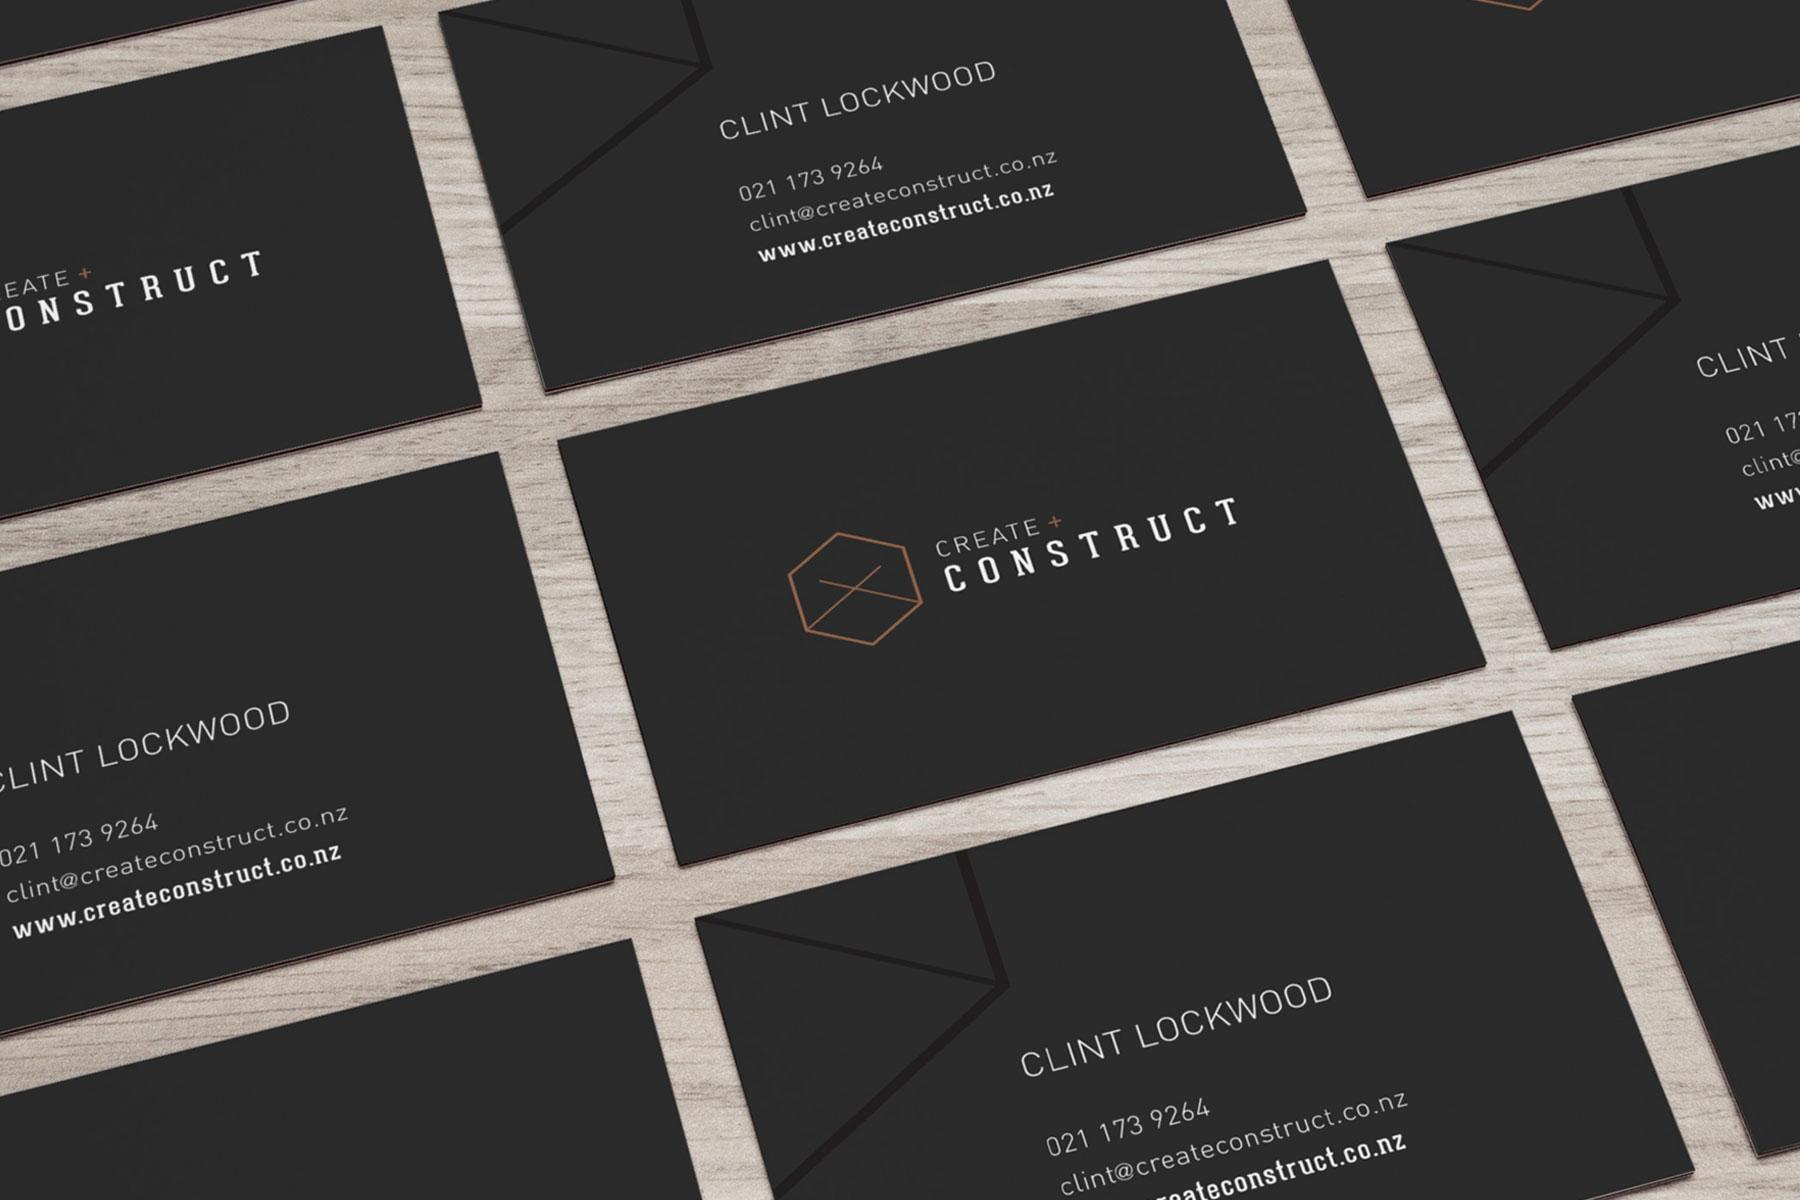 create-construct002